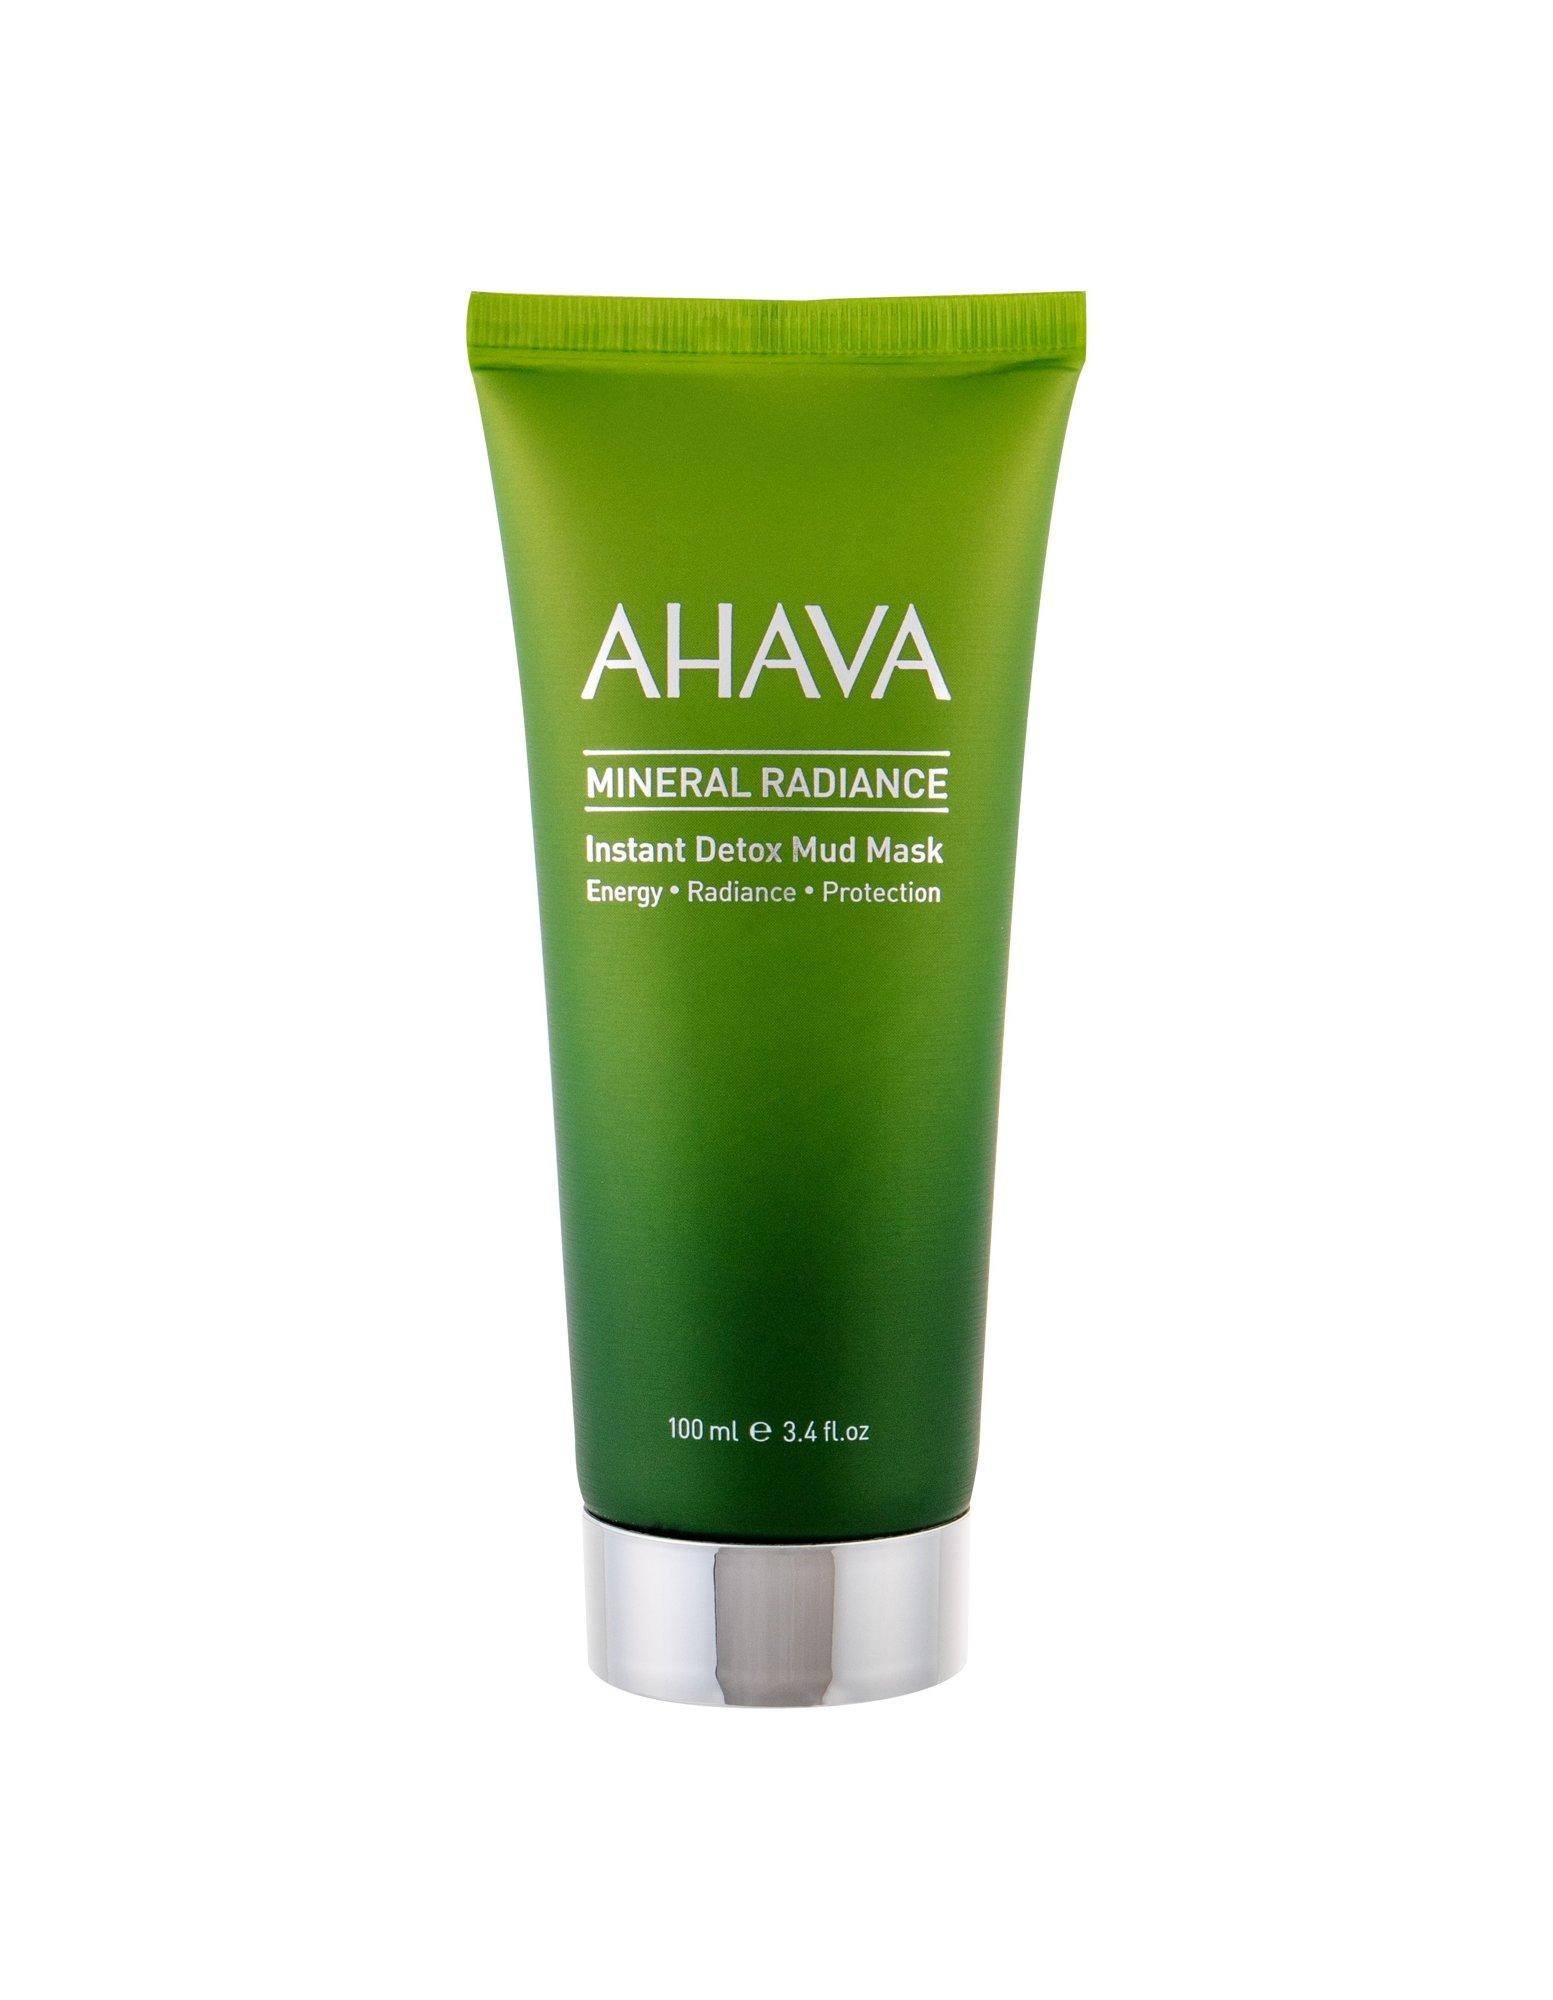 AHAVA Mineral Radiance Face Mask 100ml